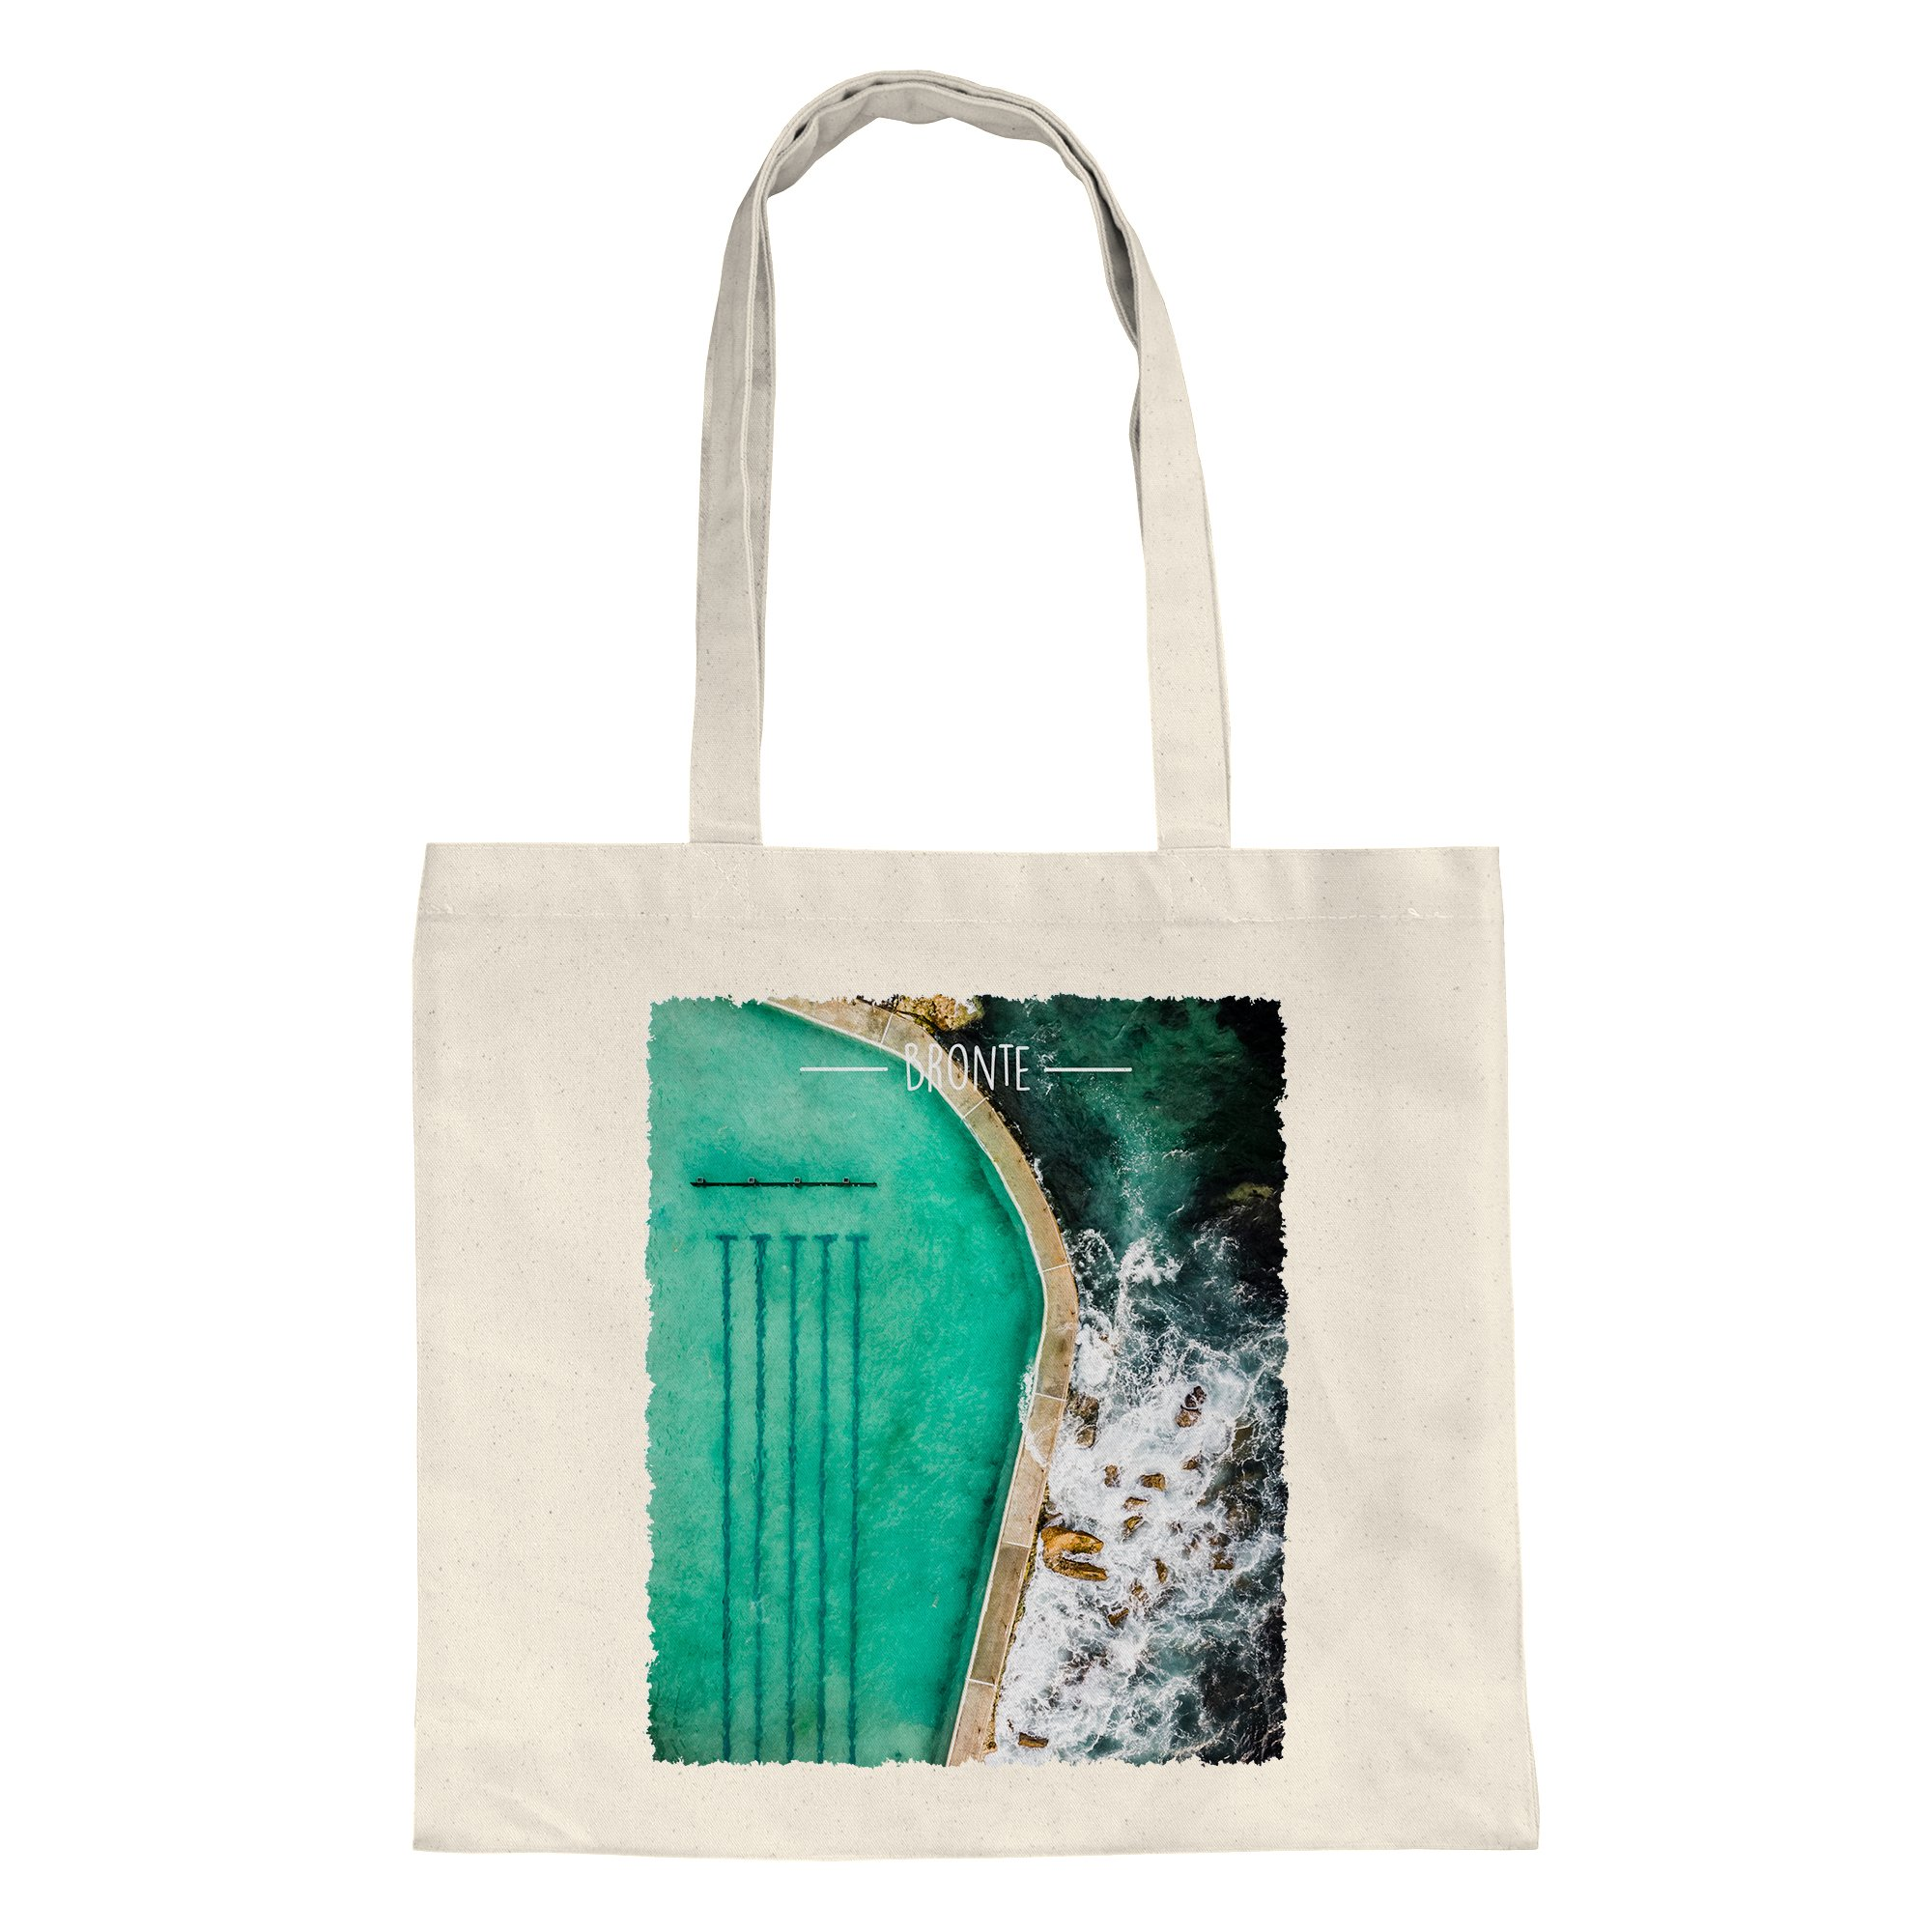 large-tote-shopping-bag-bondi-beach-ocean-pool-aerial-photography_1024x1024@2x